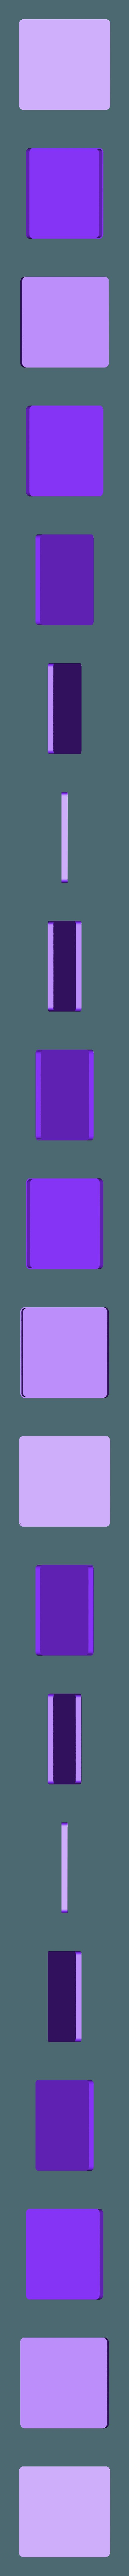 M3_Tray_v1-0_LID.STL Download free STL file M3 Screw Organizer • 3D printable template, WalterHsiao